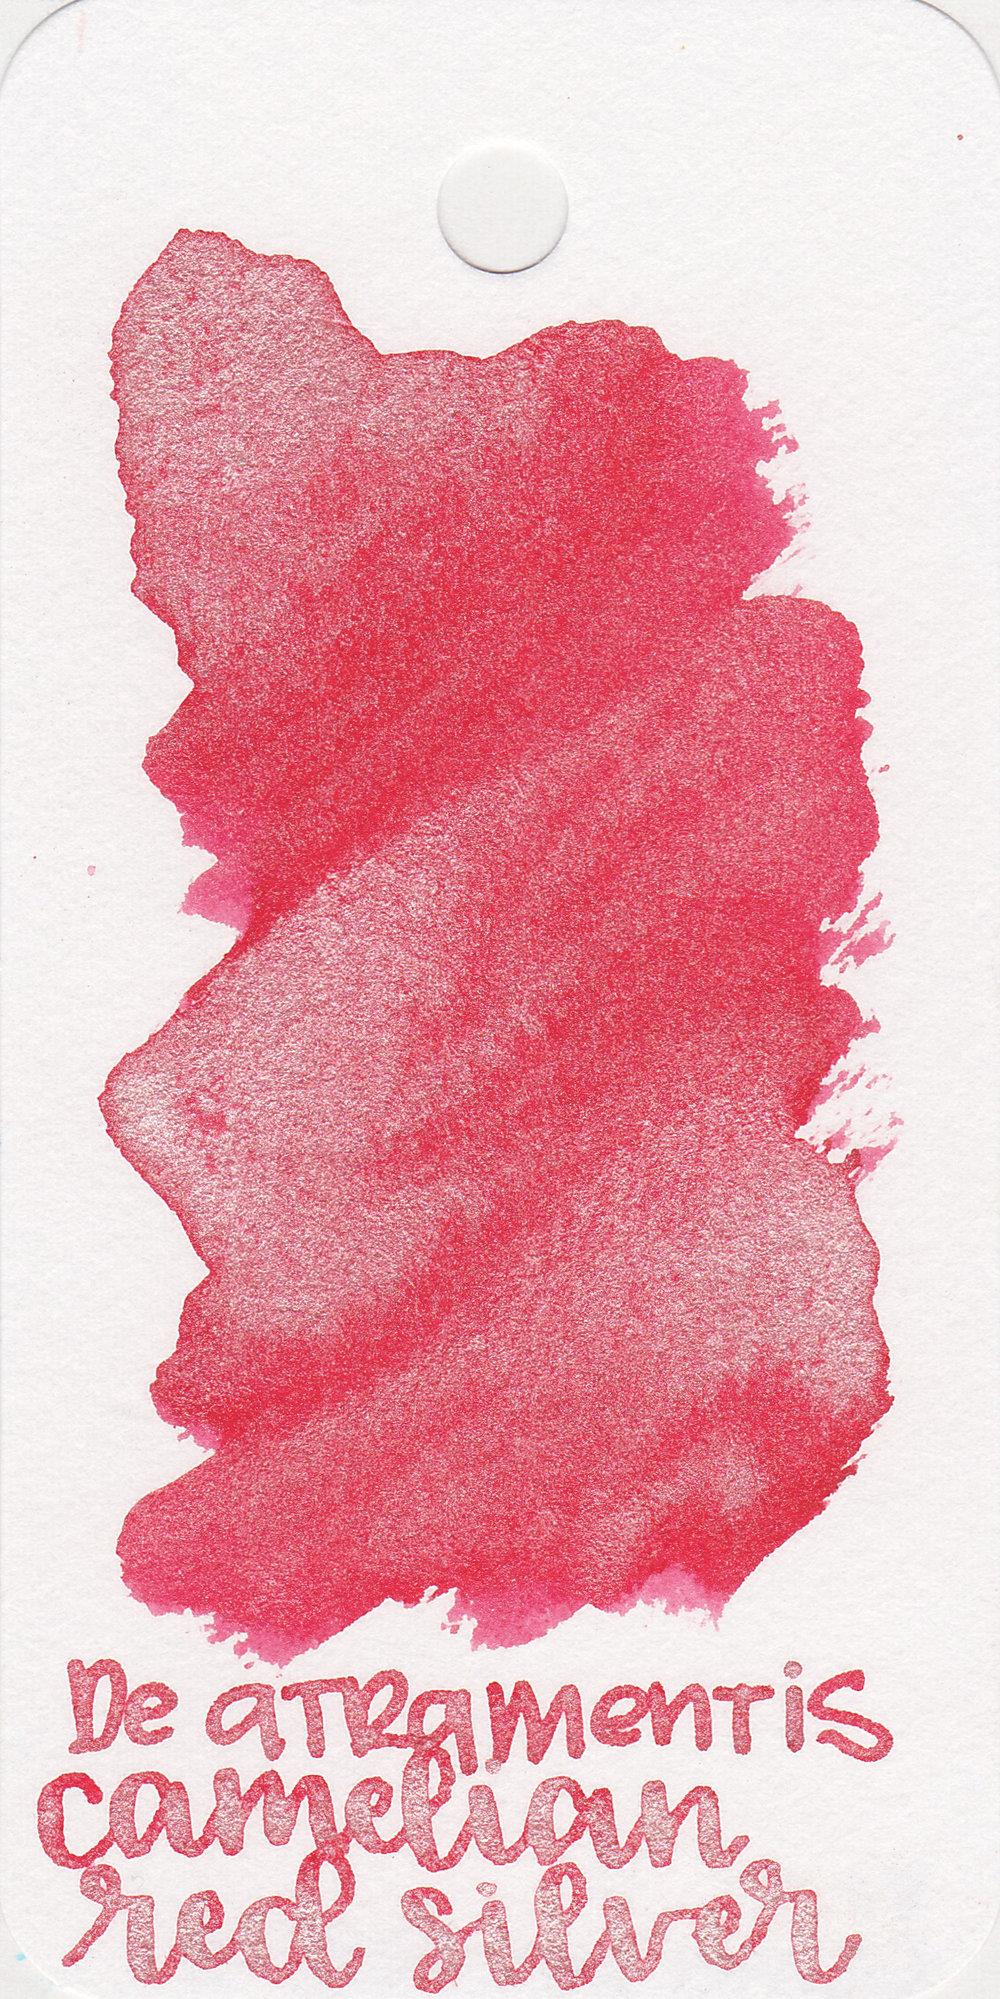 da-camelian-red-silver-1.jpg